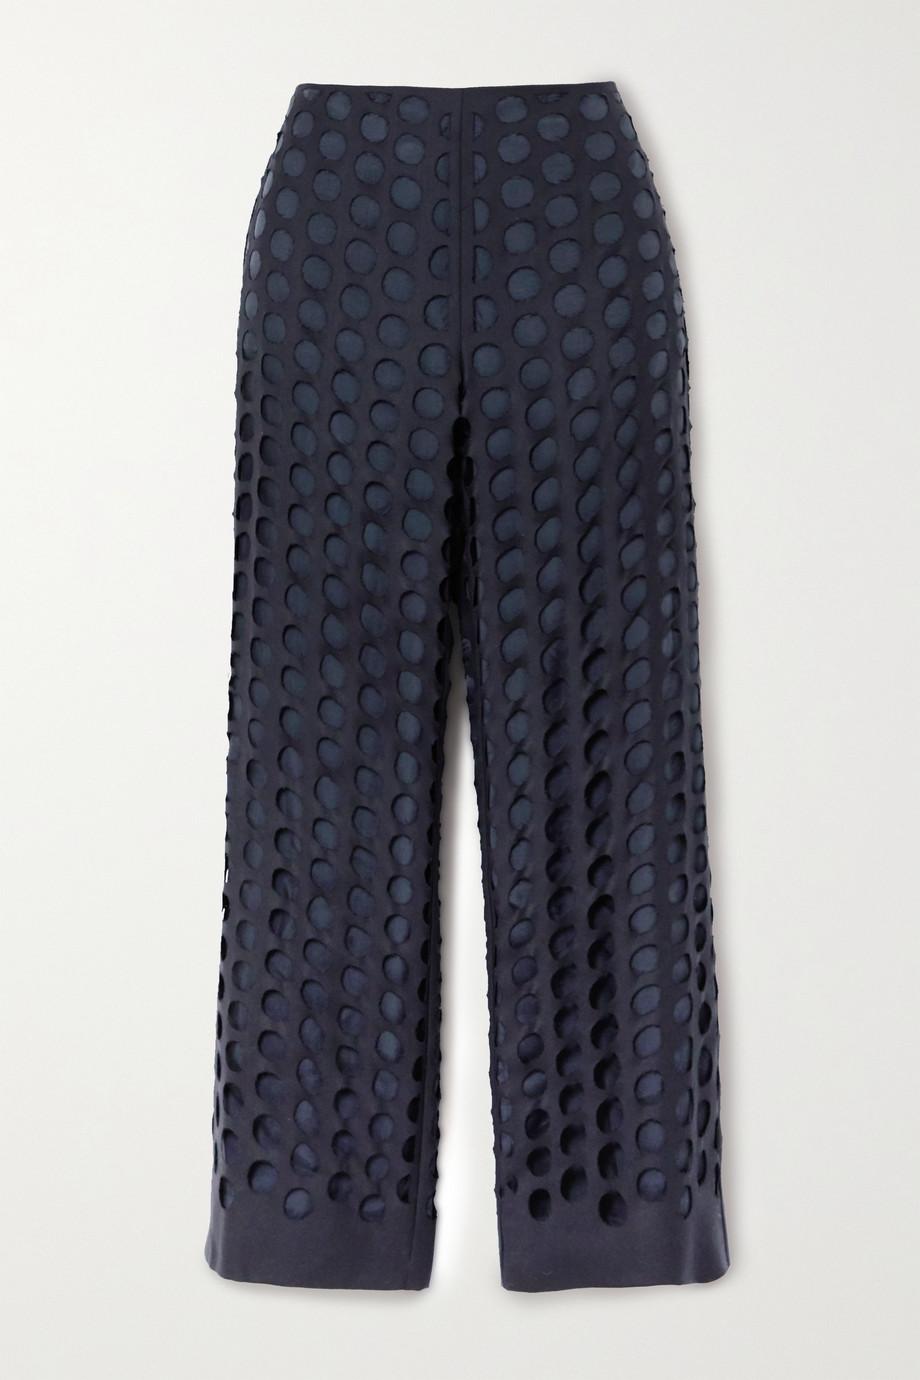 Maison Margiela Distressed woven pants